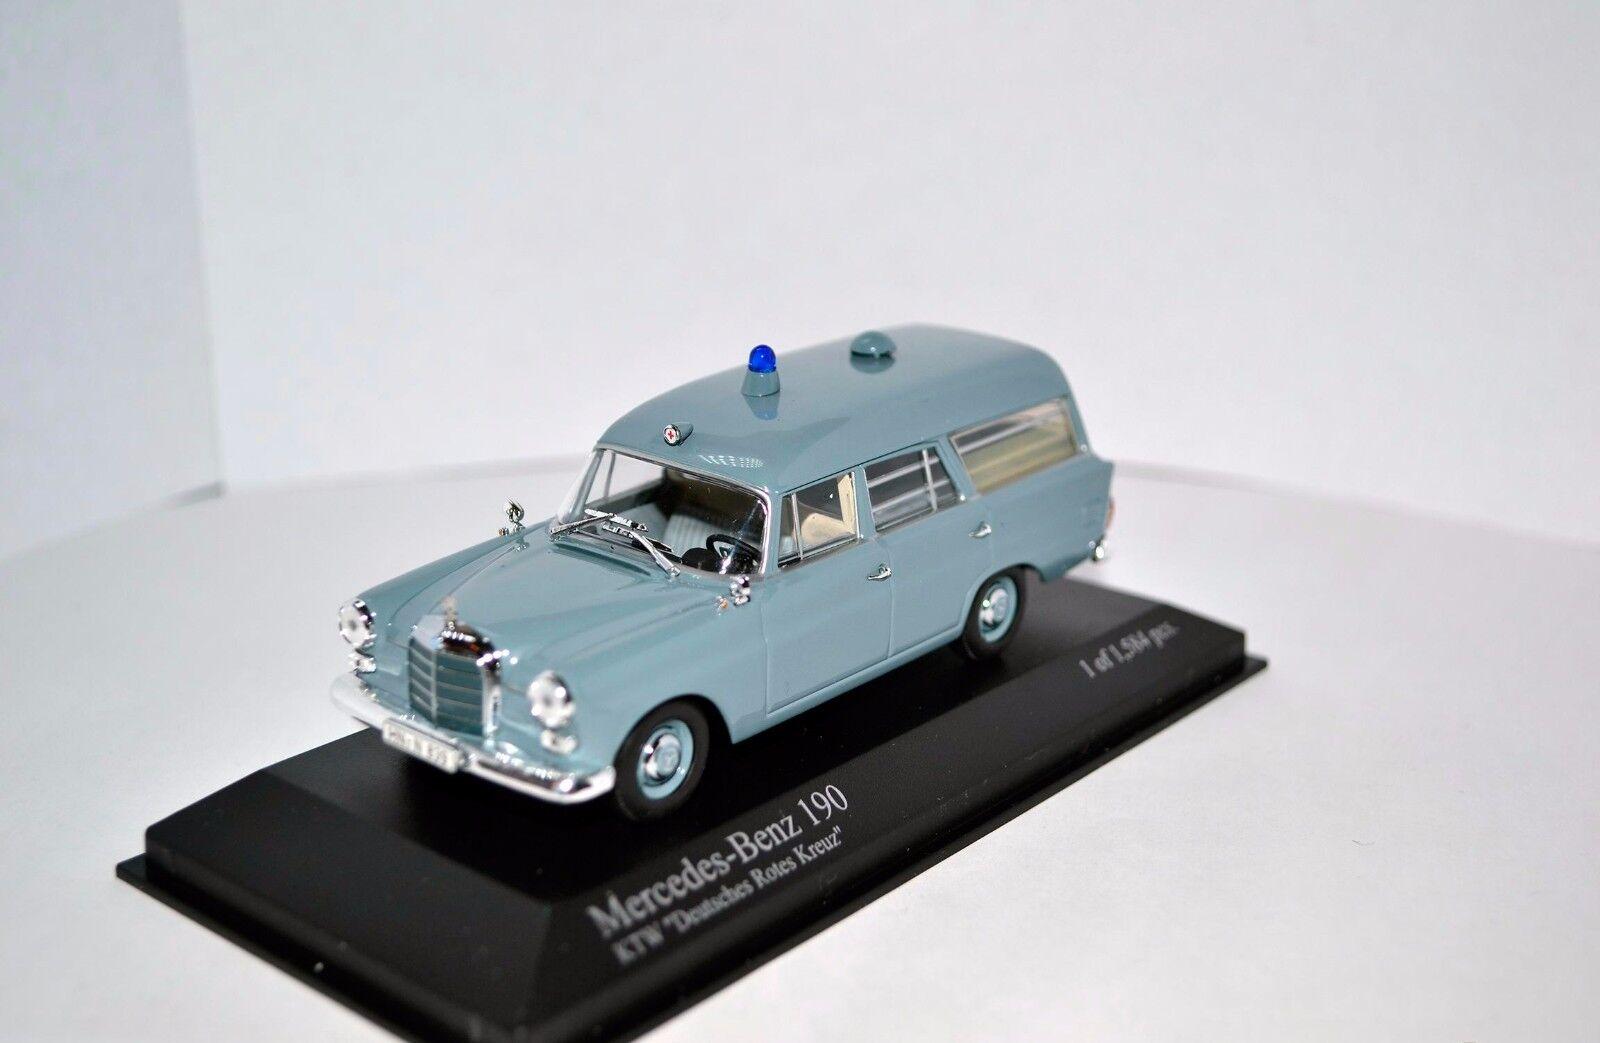 Mercedes-Benz 190 W110 Ambulance DRK 1 43 Minichamps NEW condition